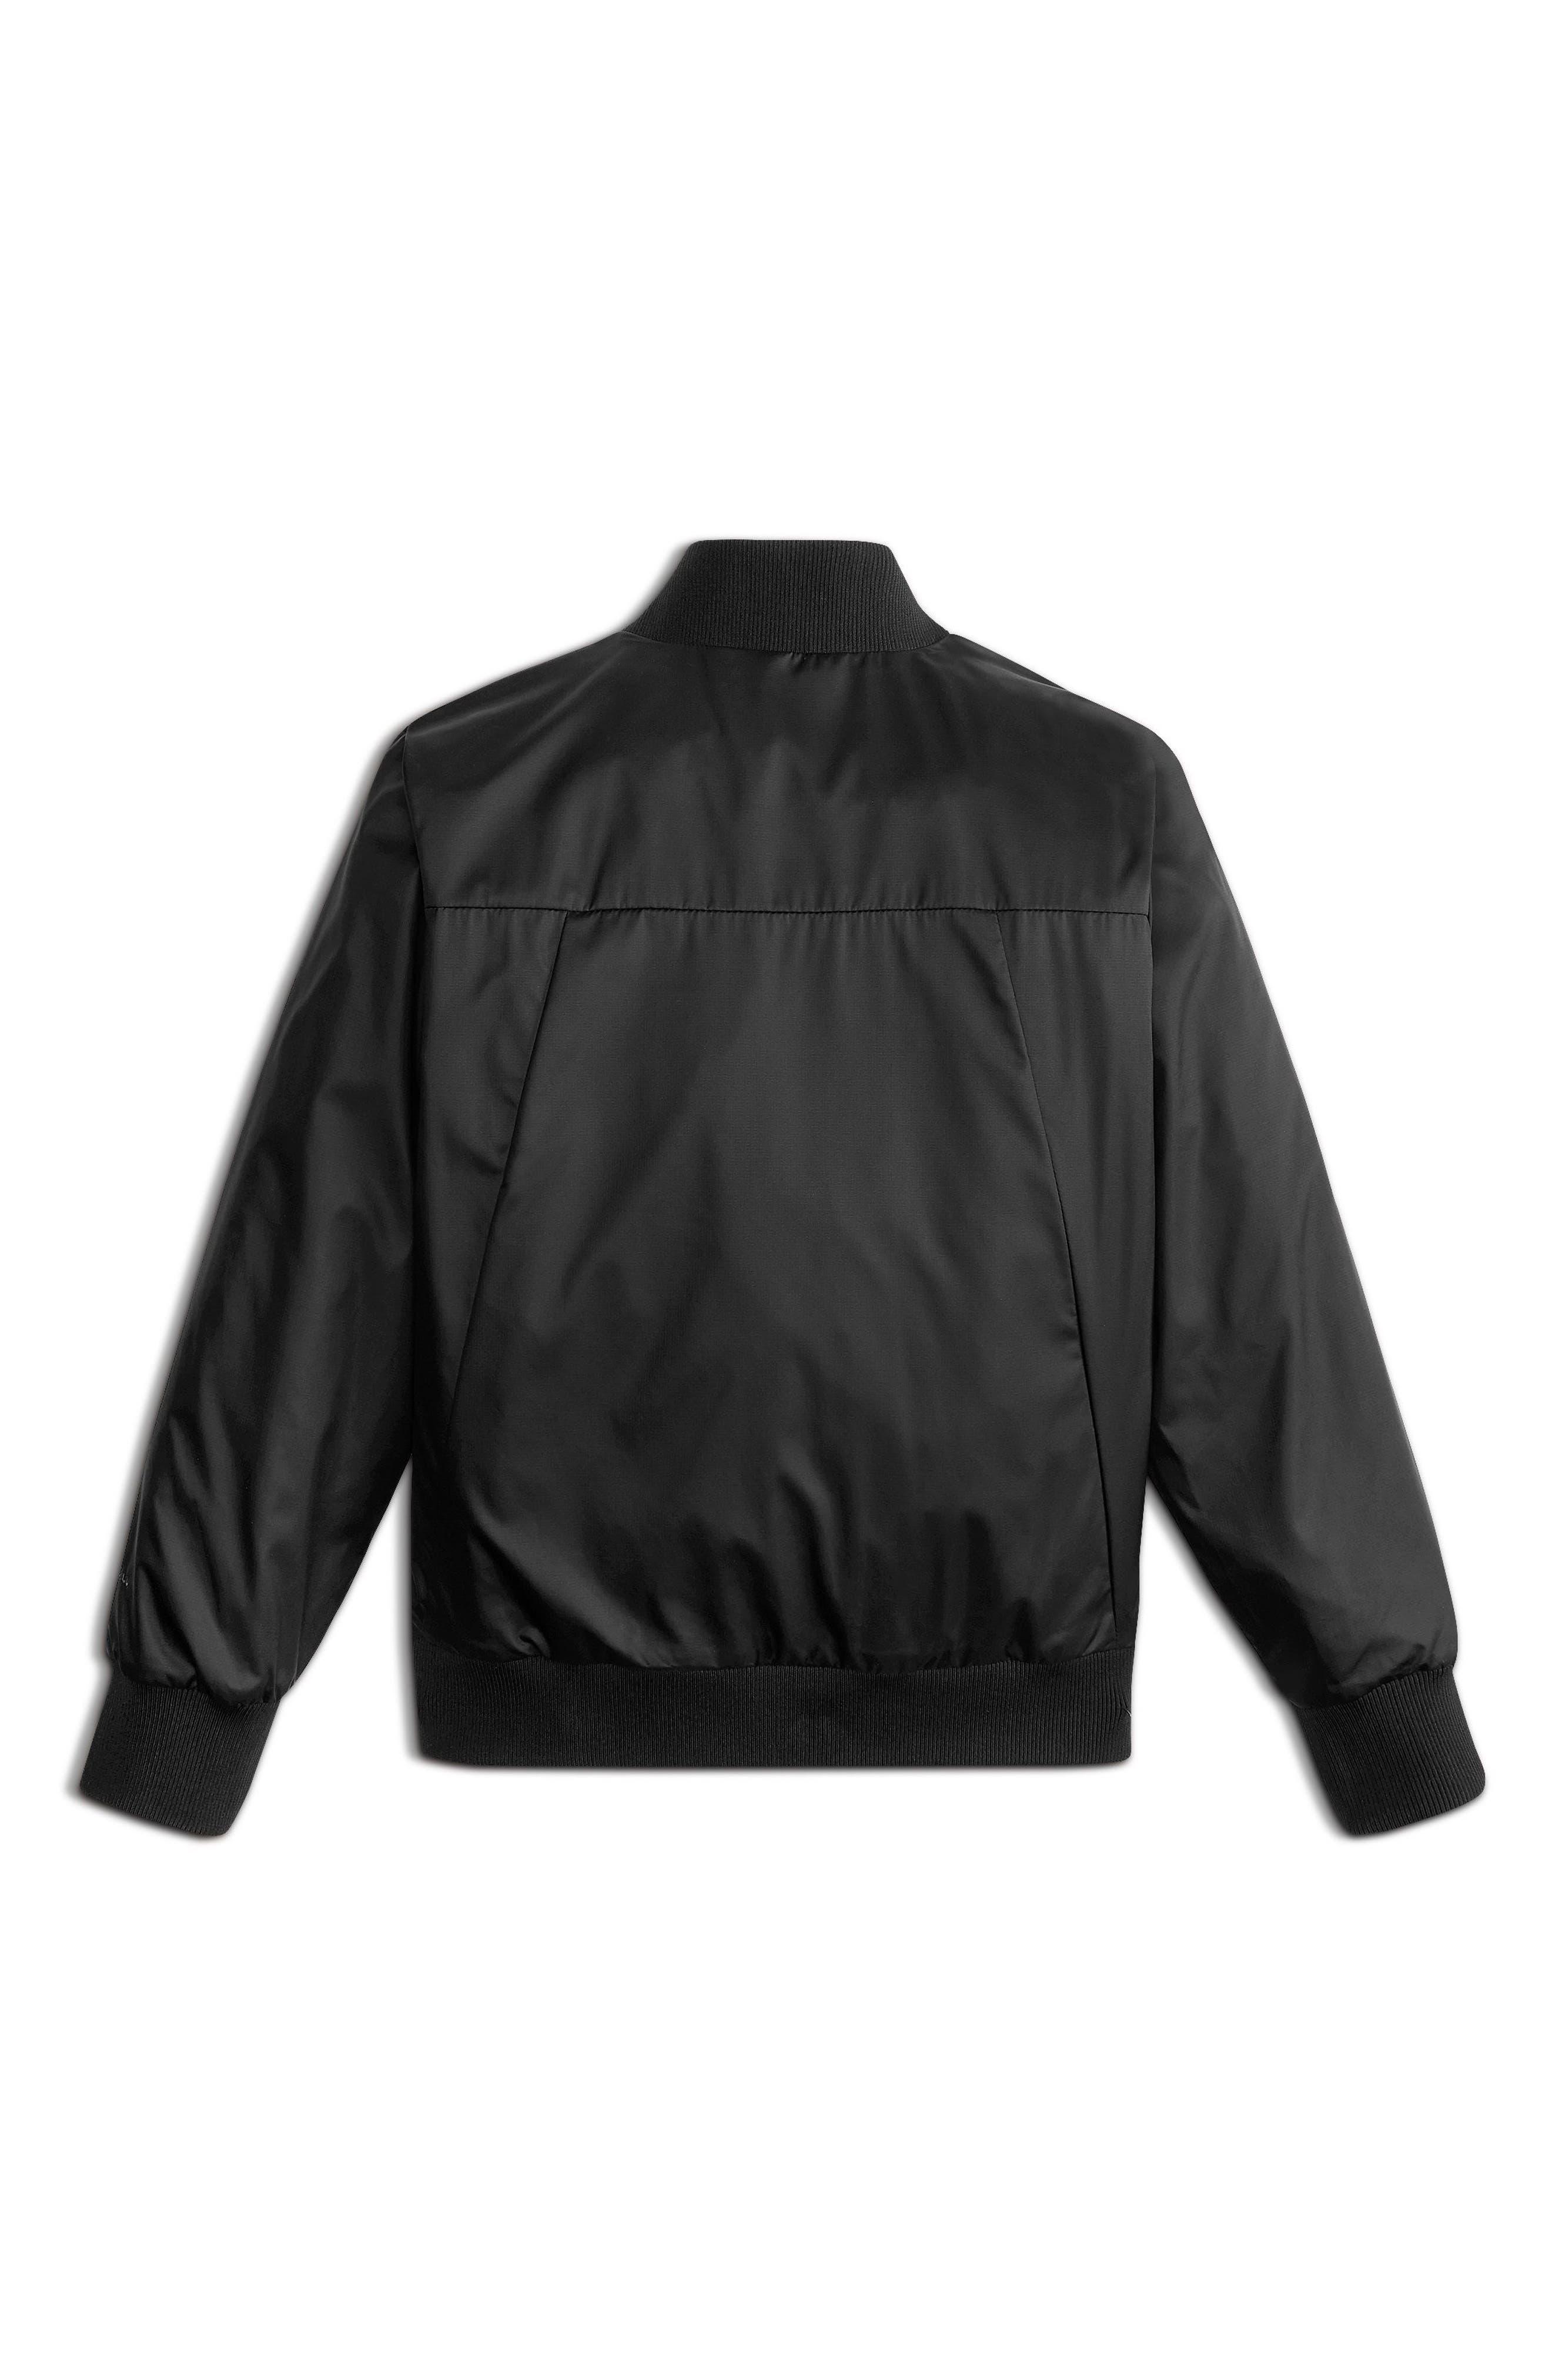 Flurry Windproof Bomber Jacket,                             Alternate thumbnail 2, color,                             Tnf Black